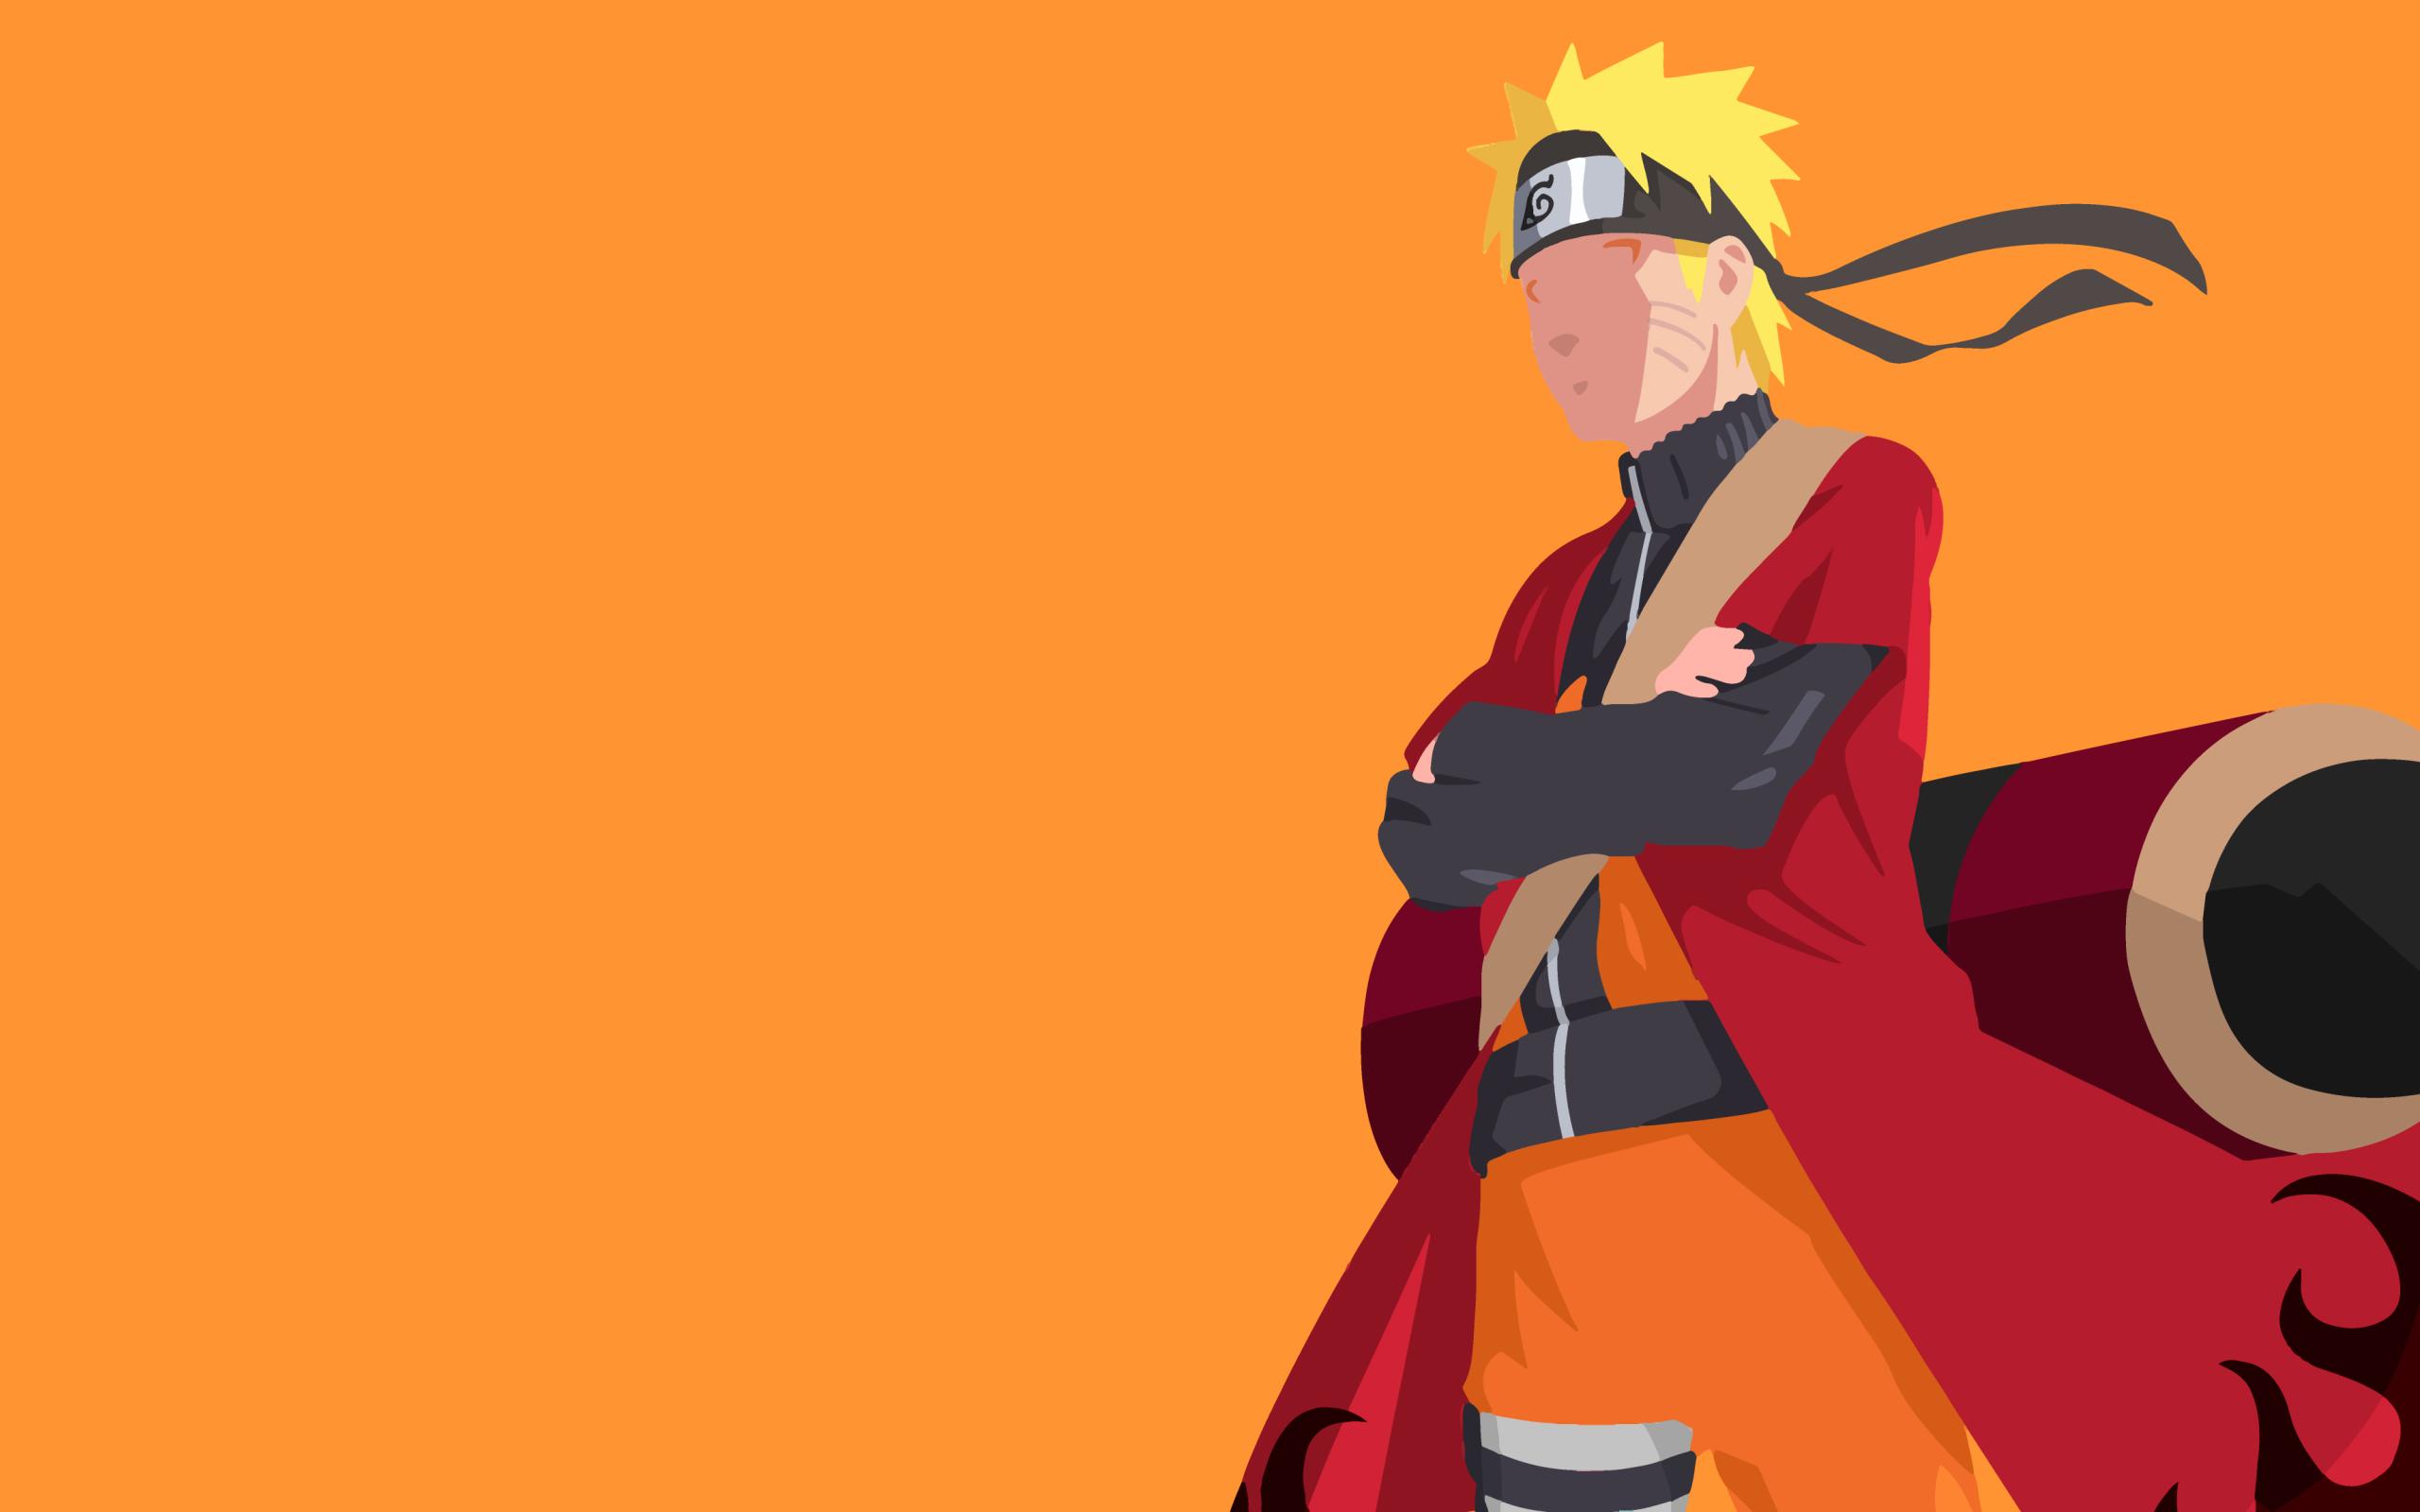 2560x1600 Hokage Naruto 4K 2560x1600 Resolution Wallpaper ...